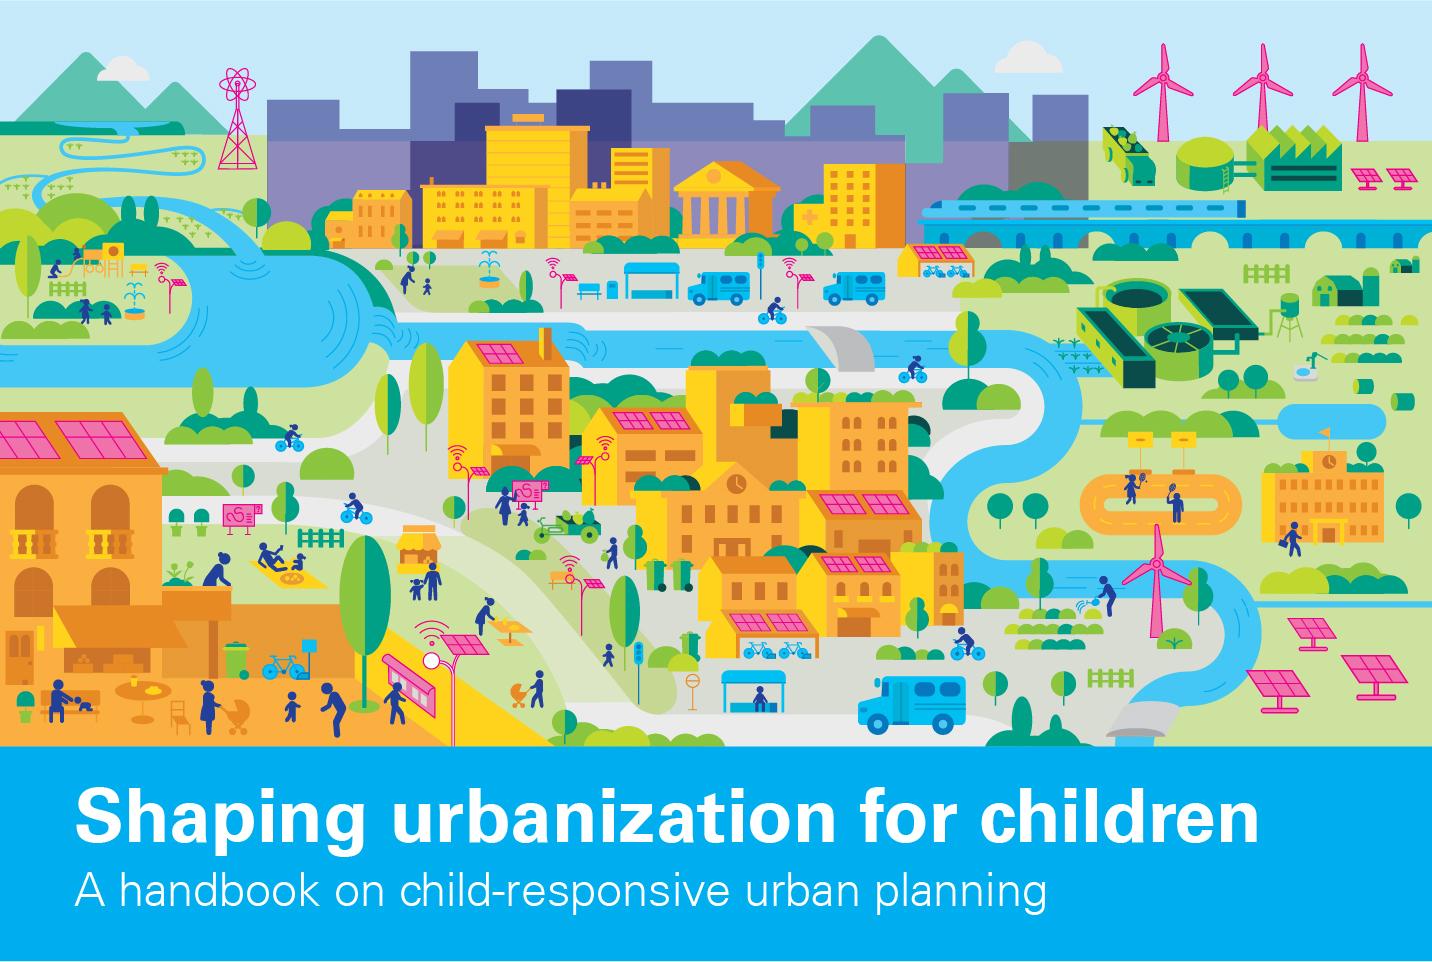 ISOCARP collaborates with UNICEF.